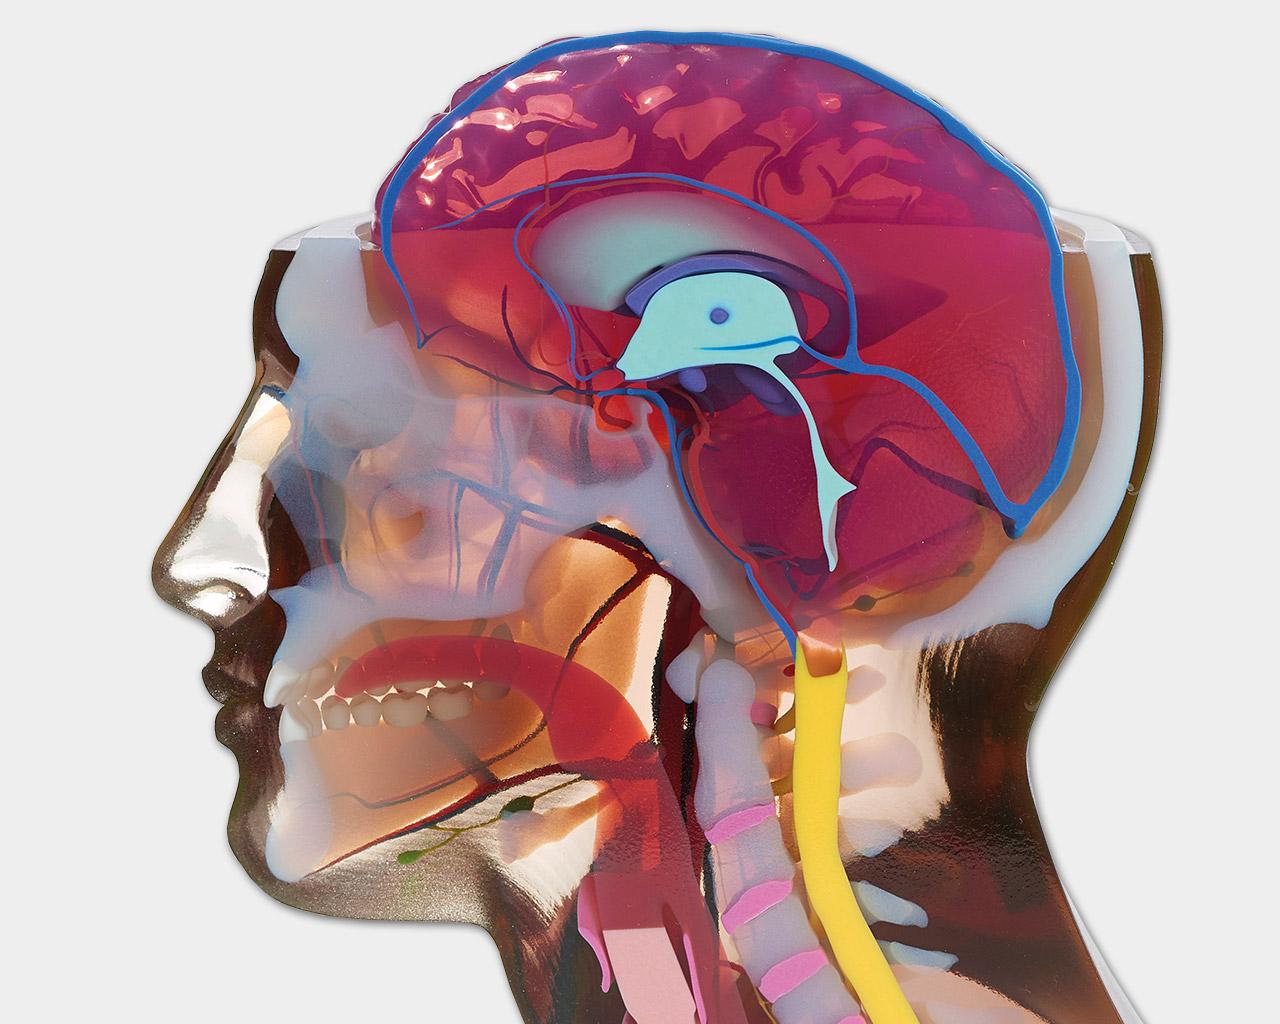 Vollfarb 3D Druck Anwendung Medizin